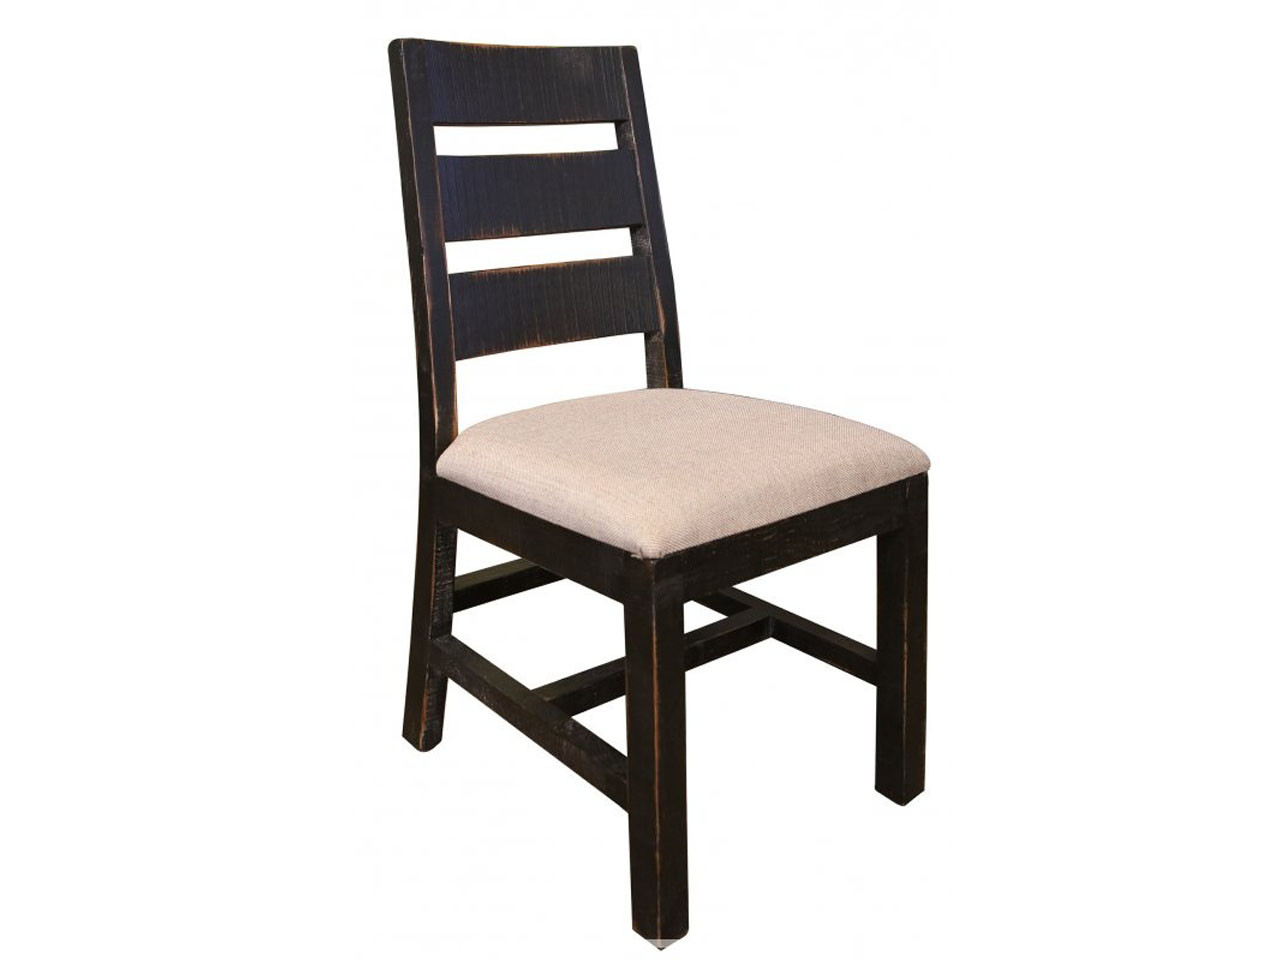 Rustic Black Ladder Back Chair